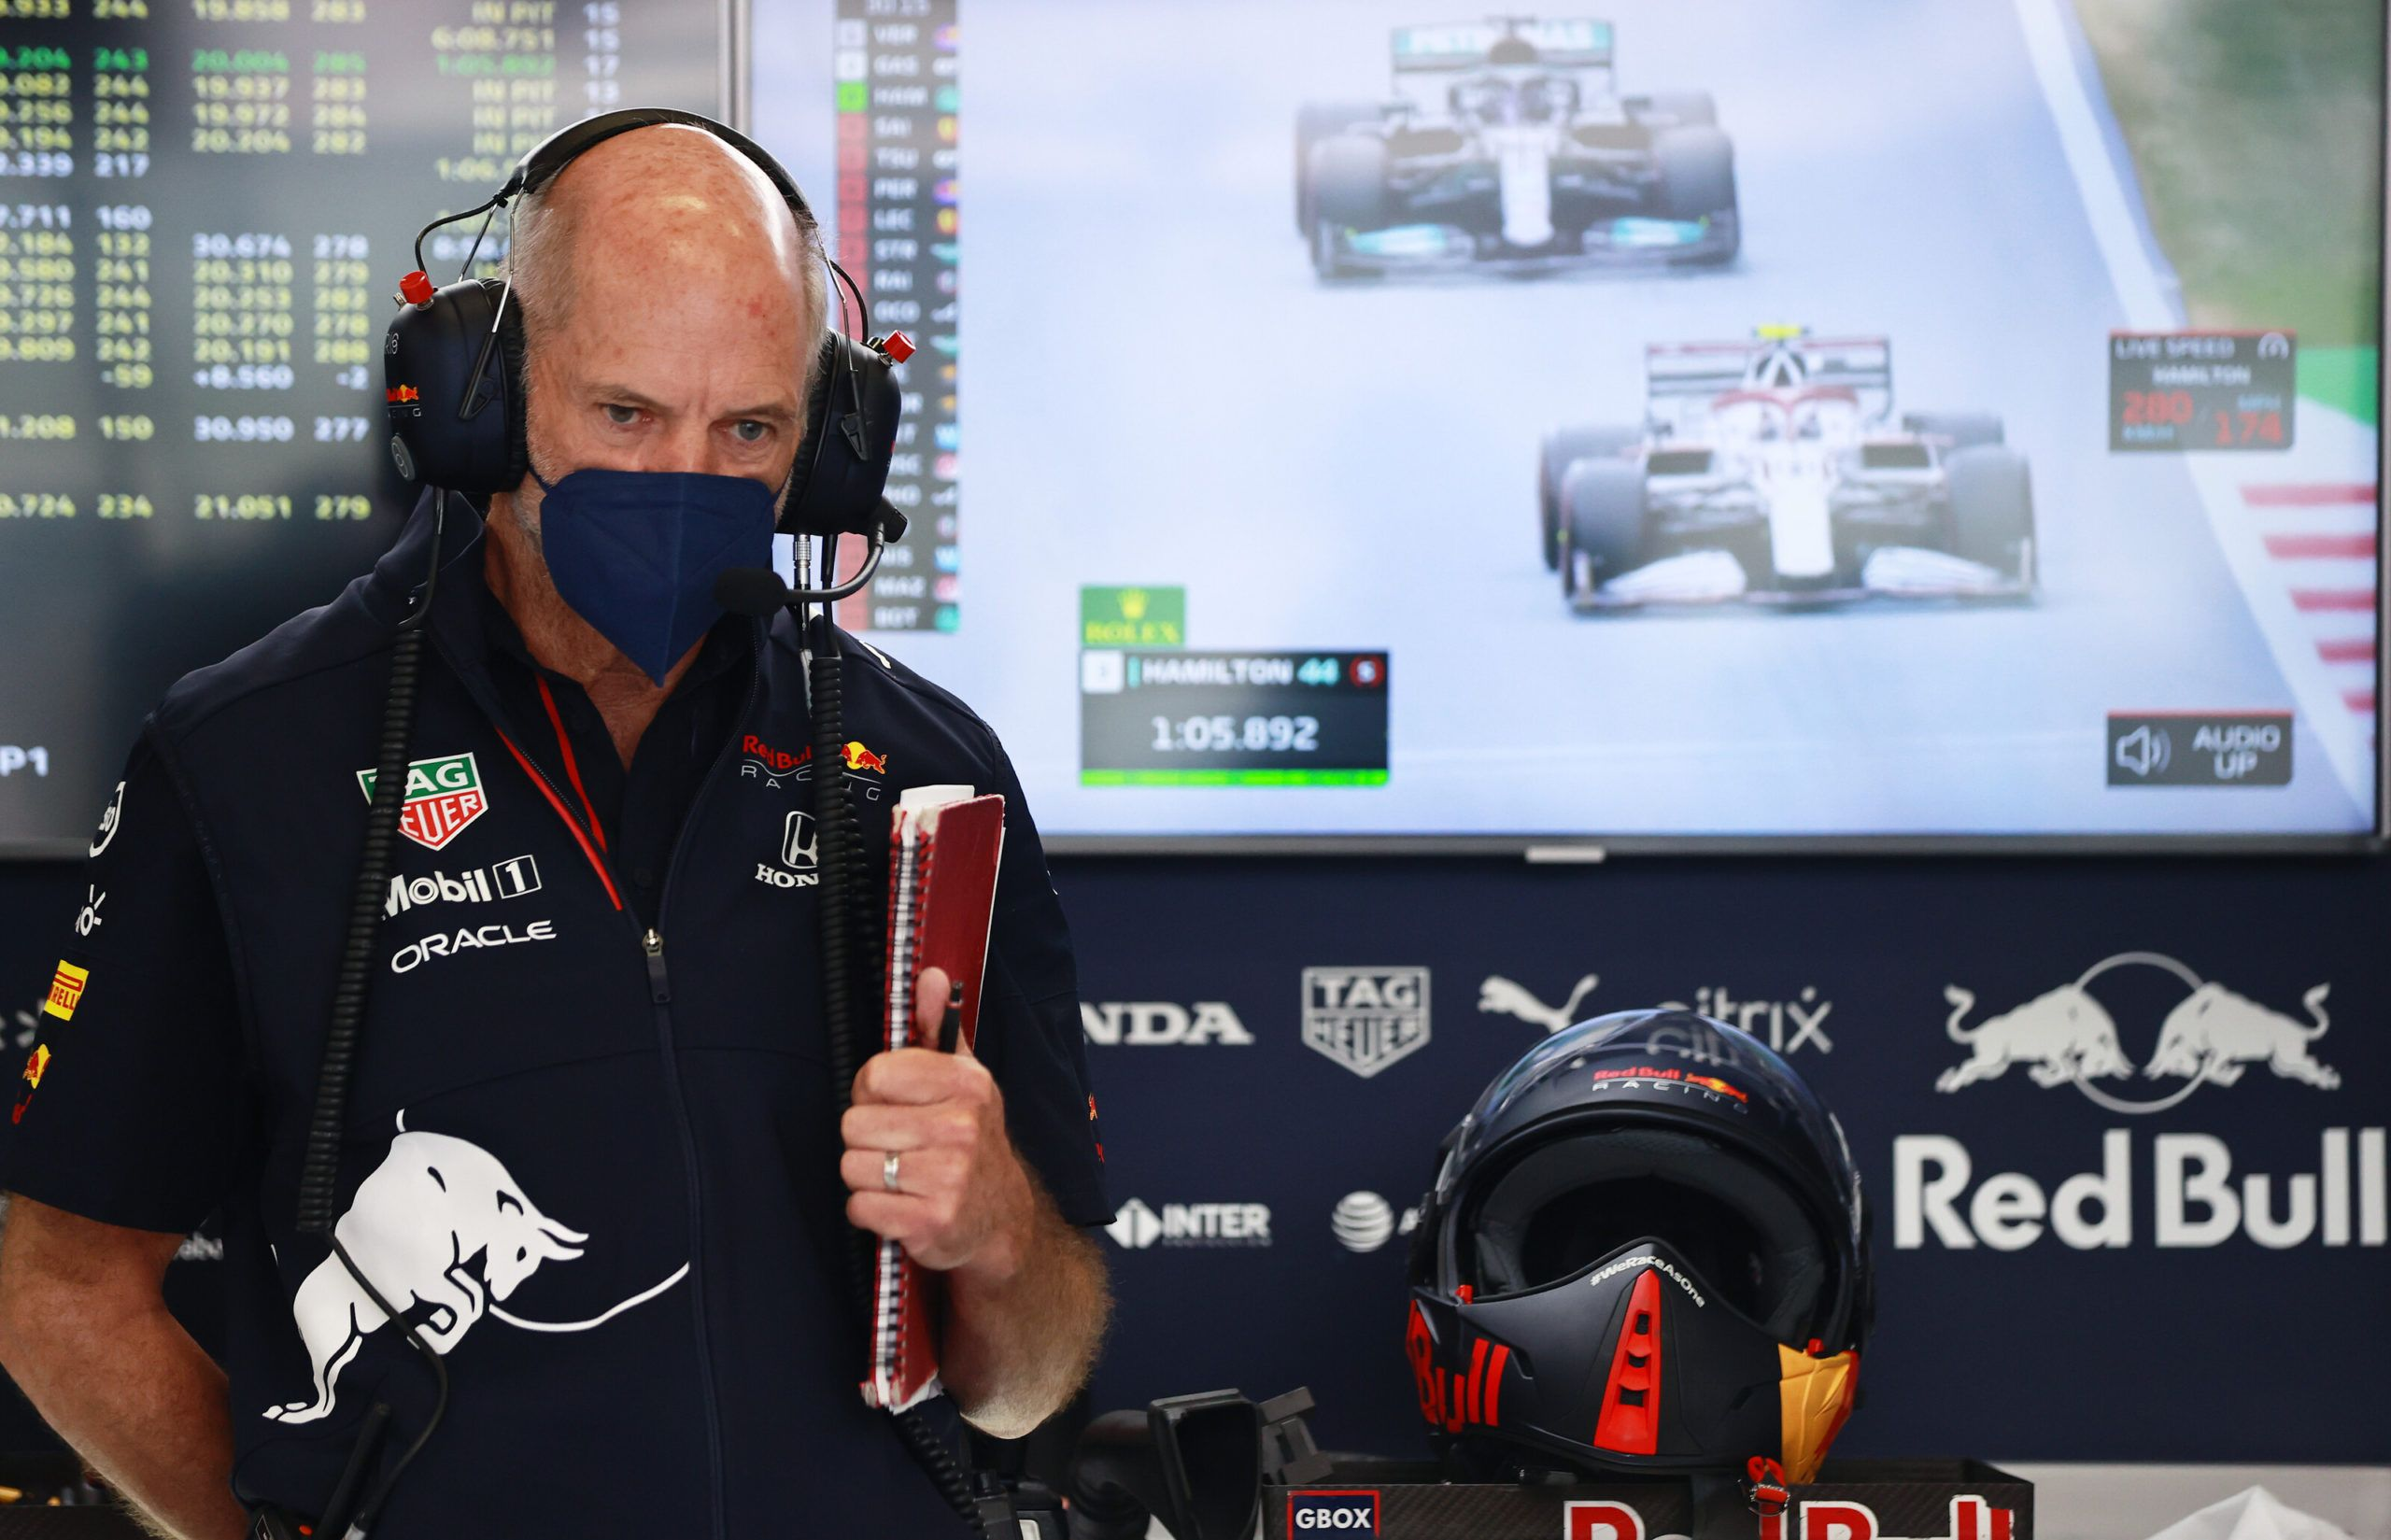 Adrian Newey, F1, Red Bull